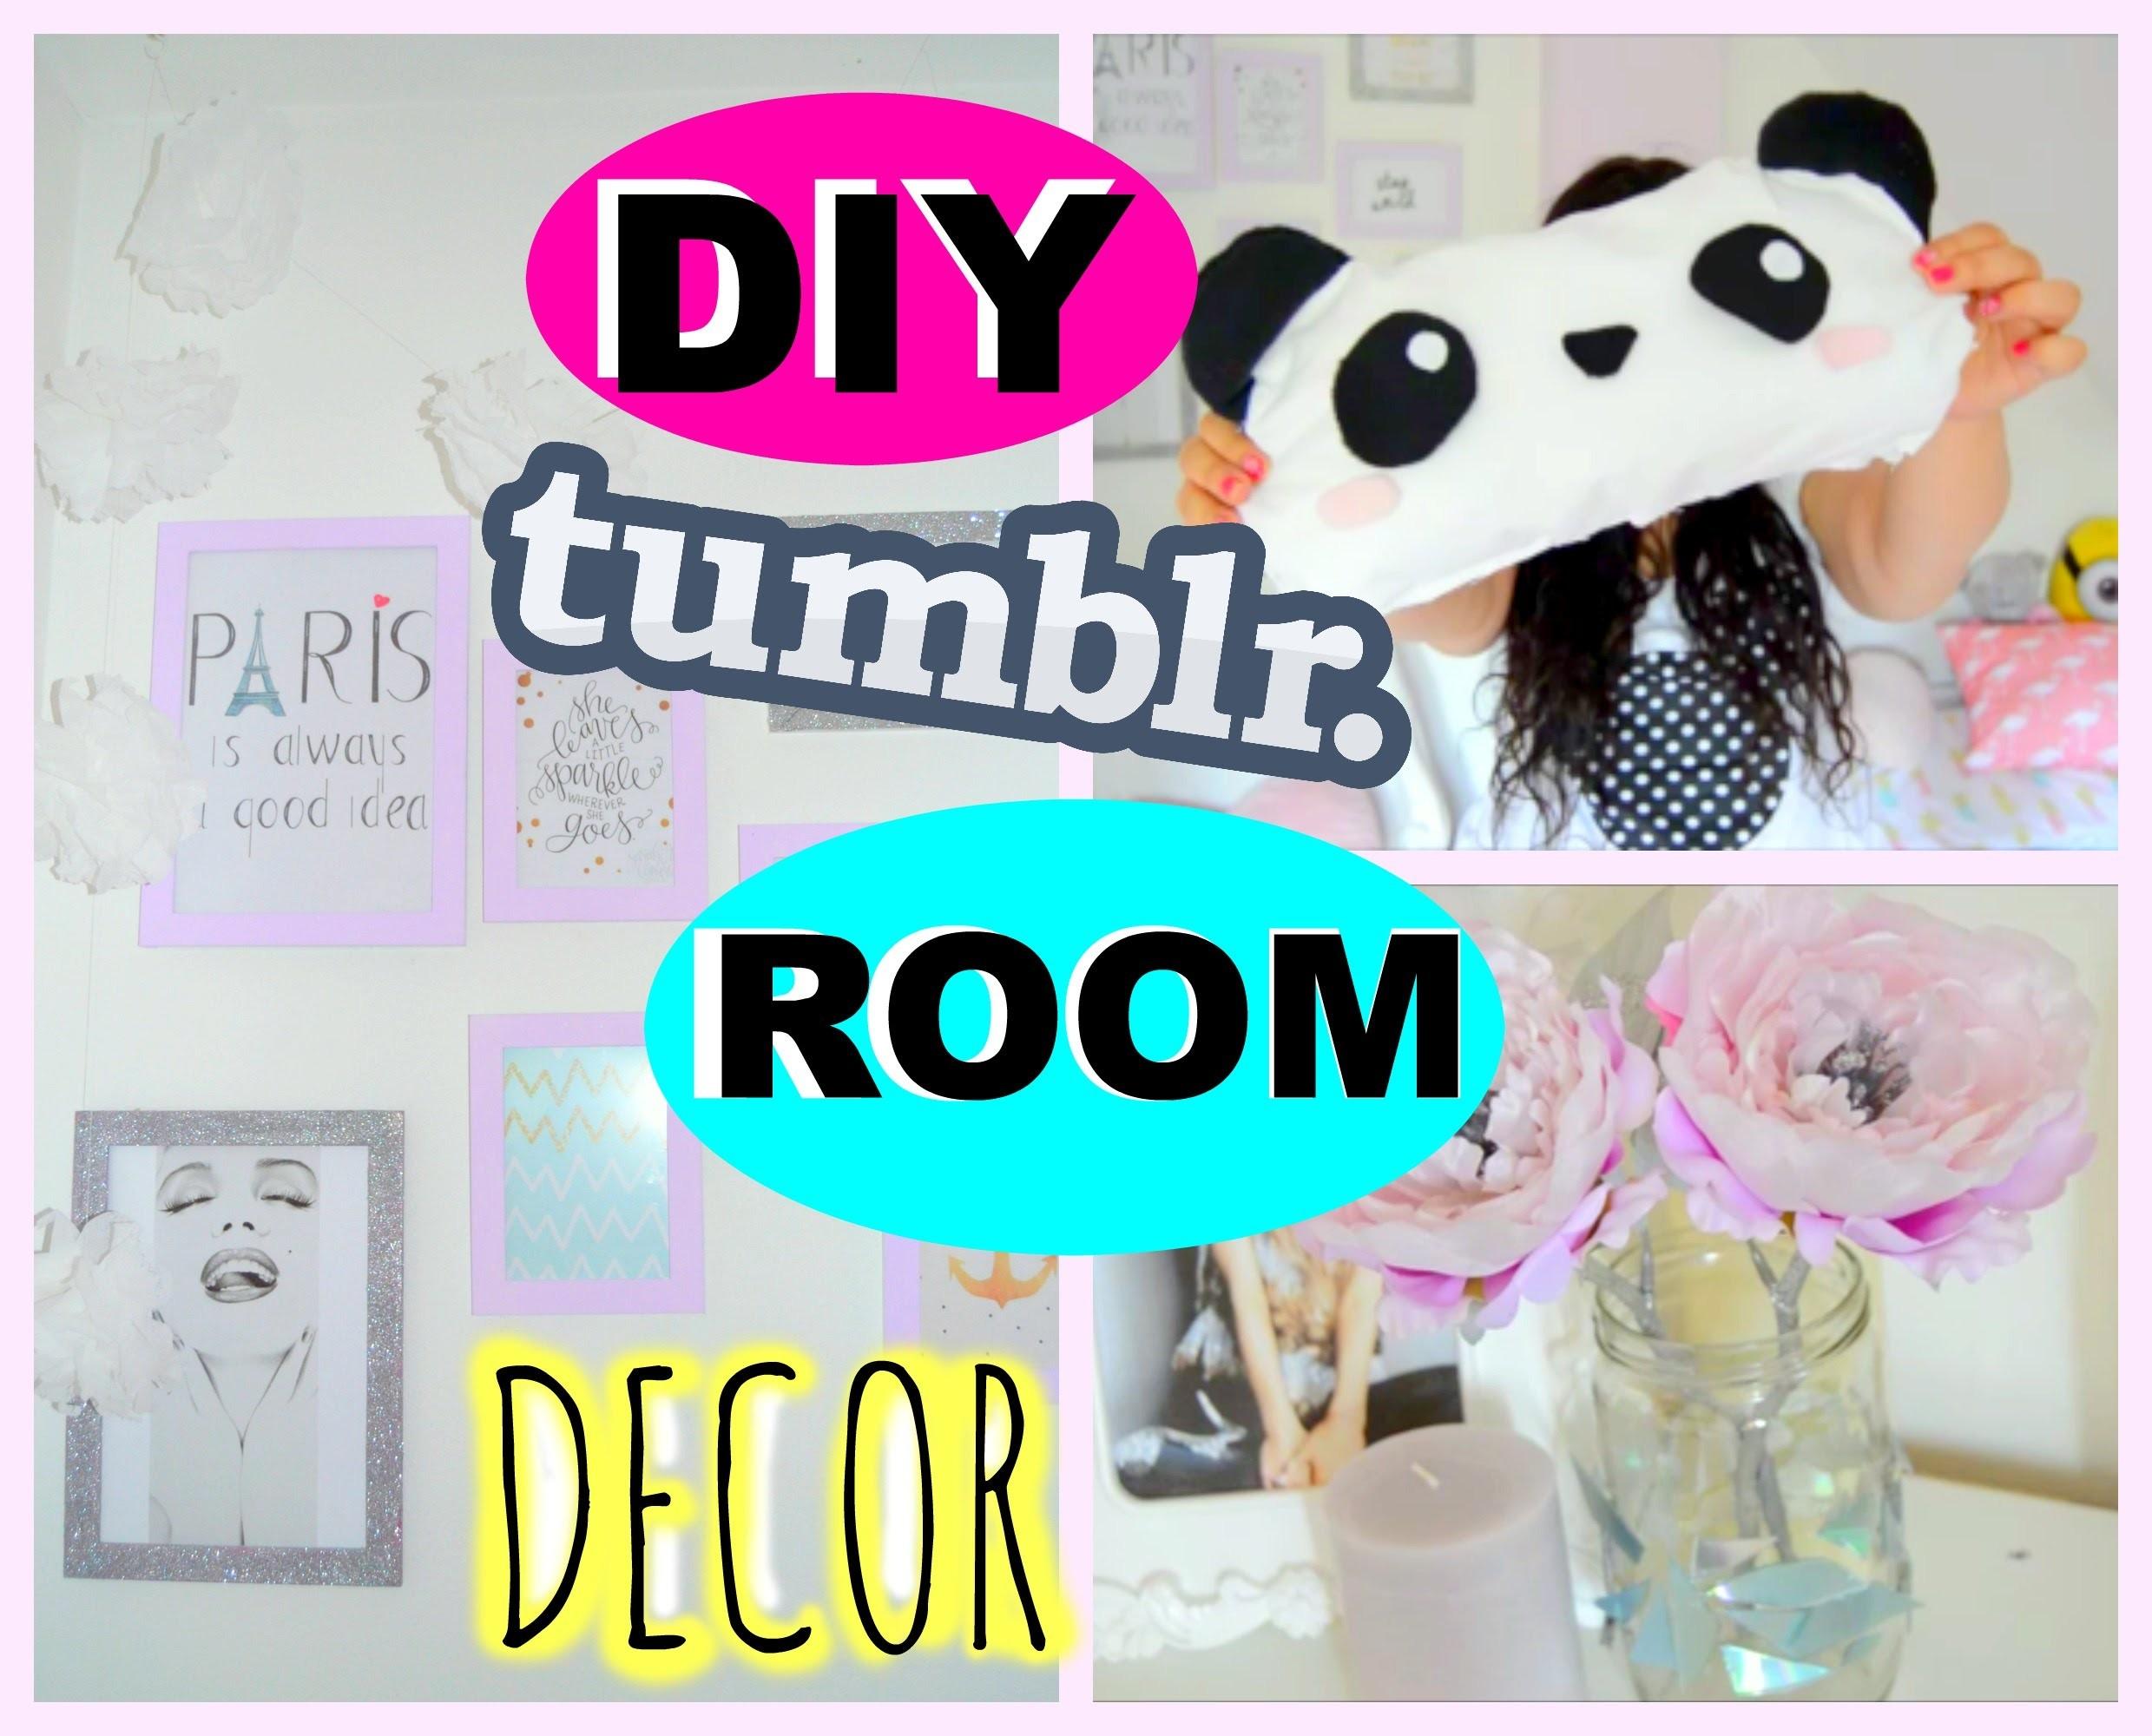 ♡ DIY Room Decor! Tumblr Inspired Room Decorations! ♡ (dekorace do pokoje)